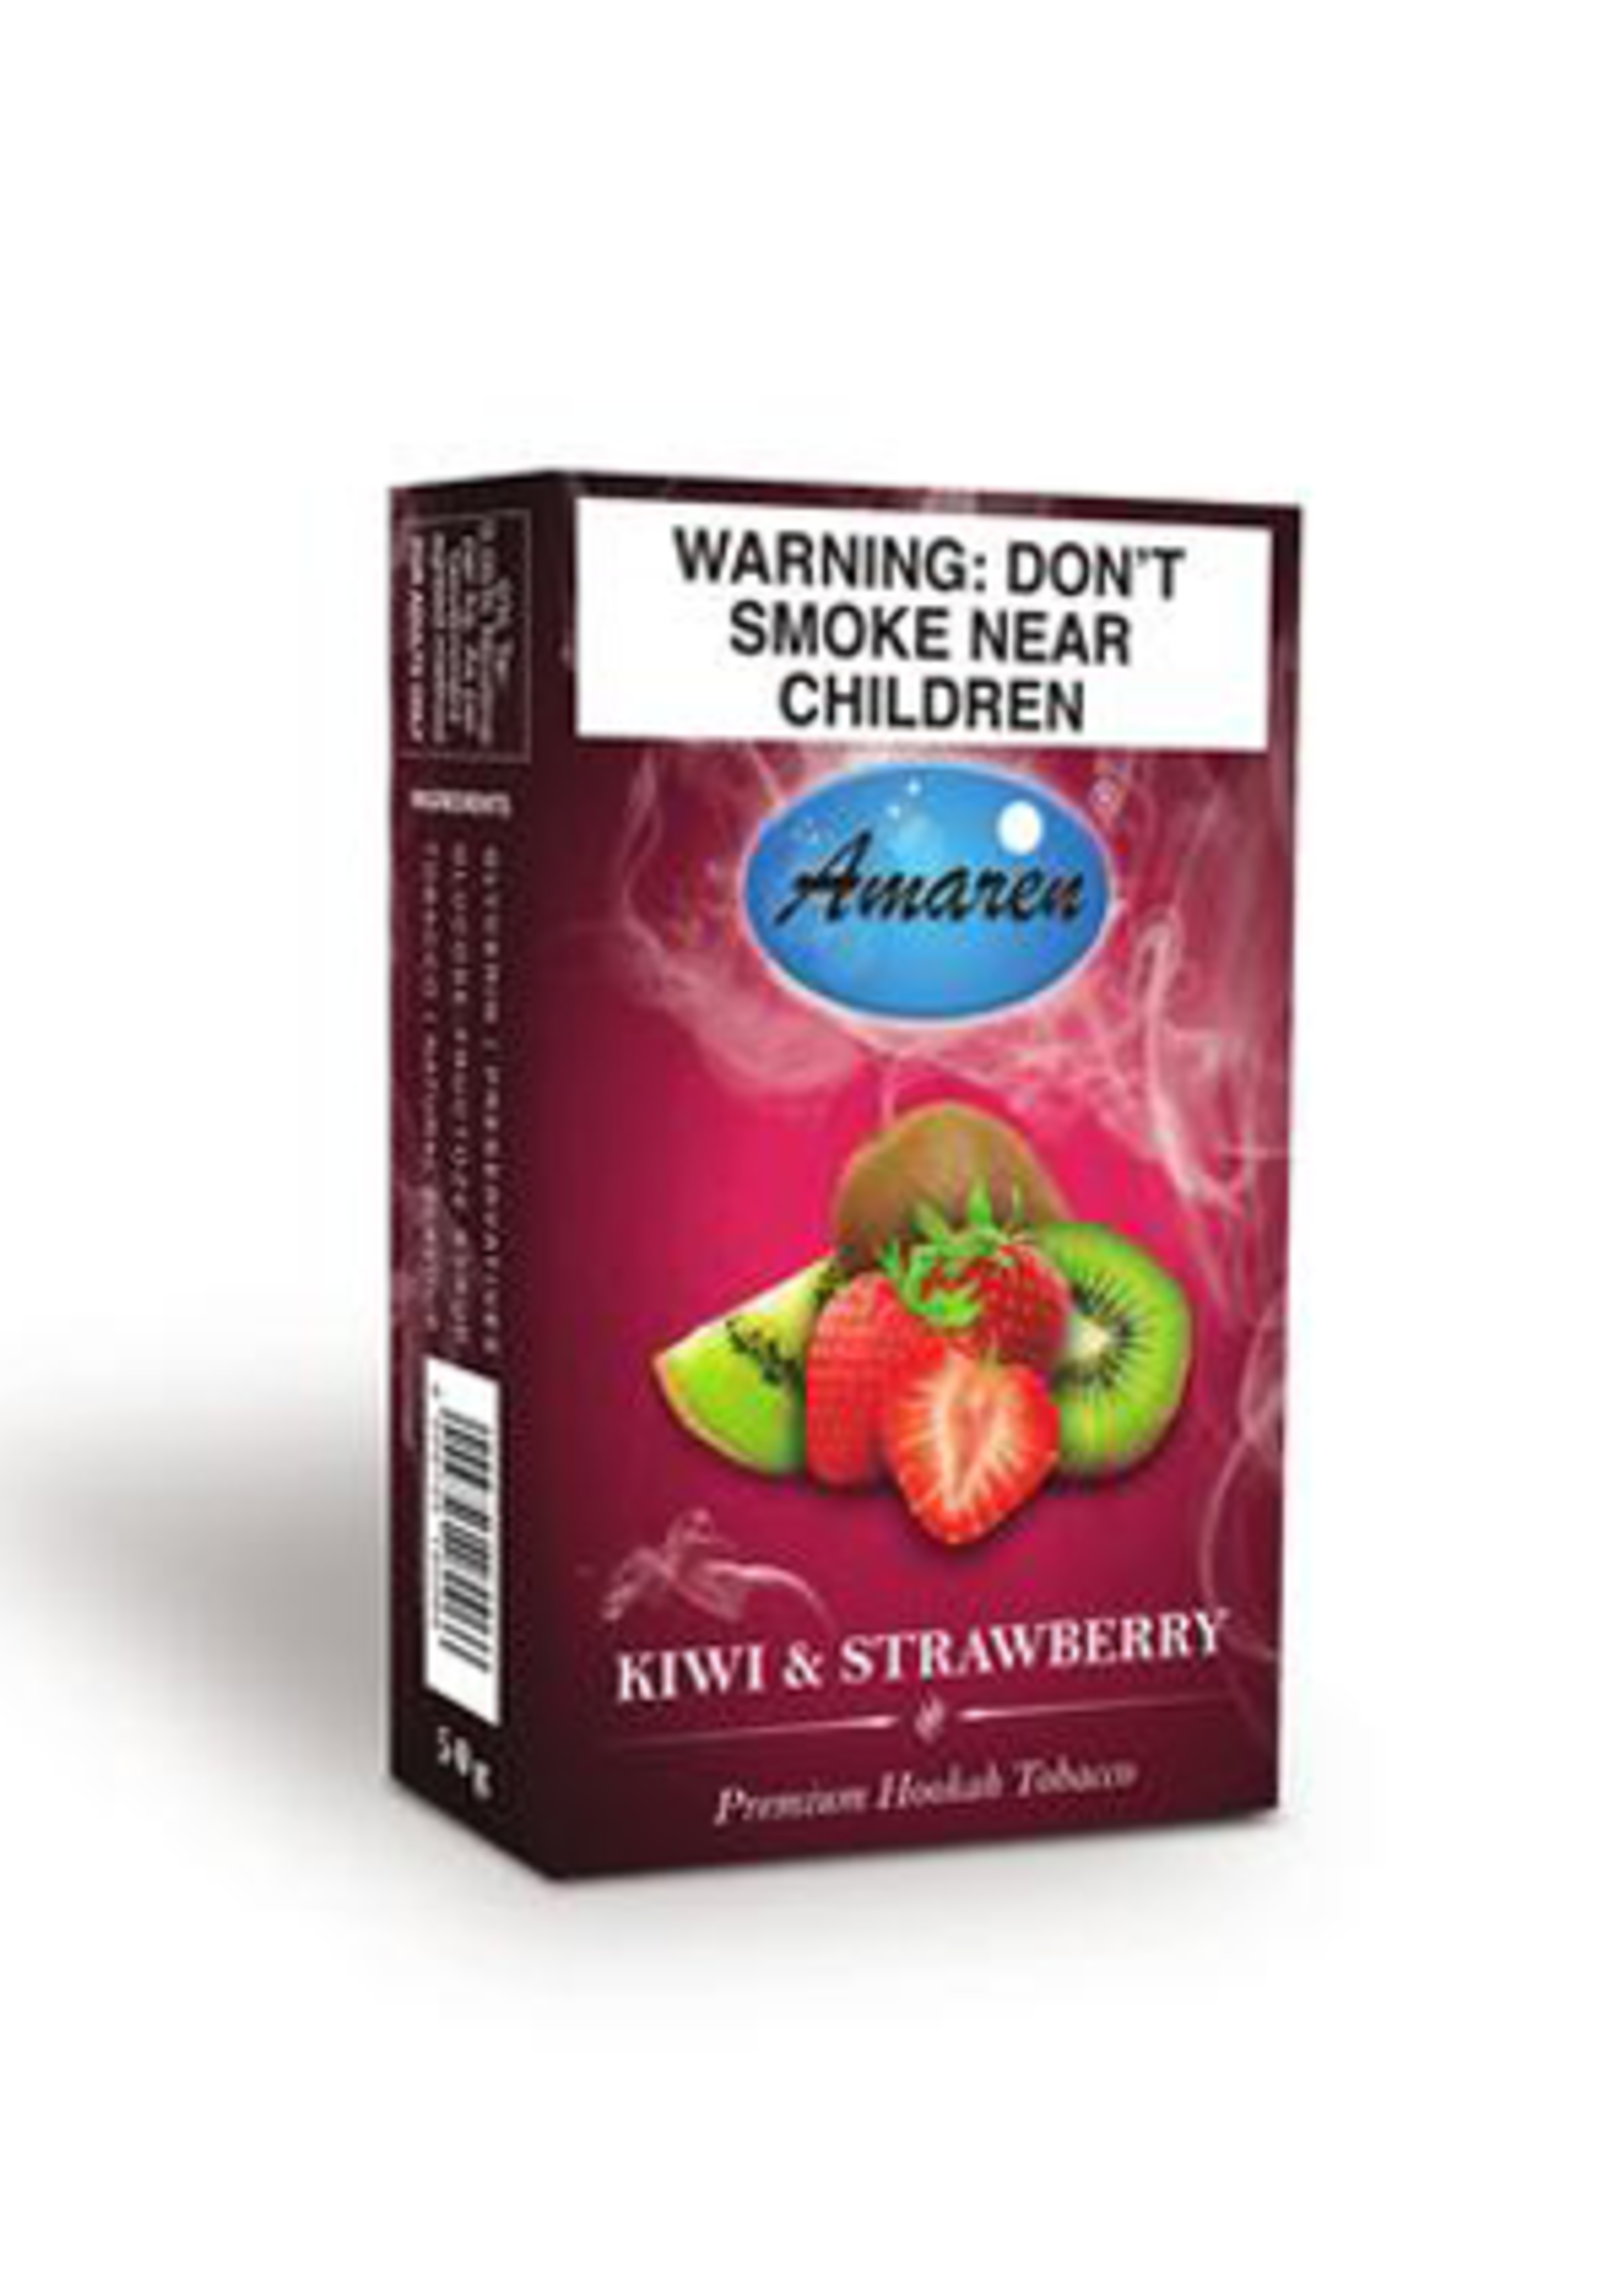 Amaren hubbly flavour - kiwi & strawberry